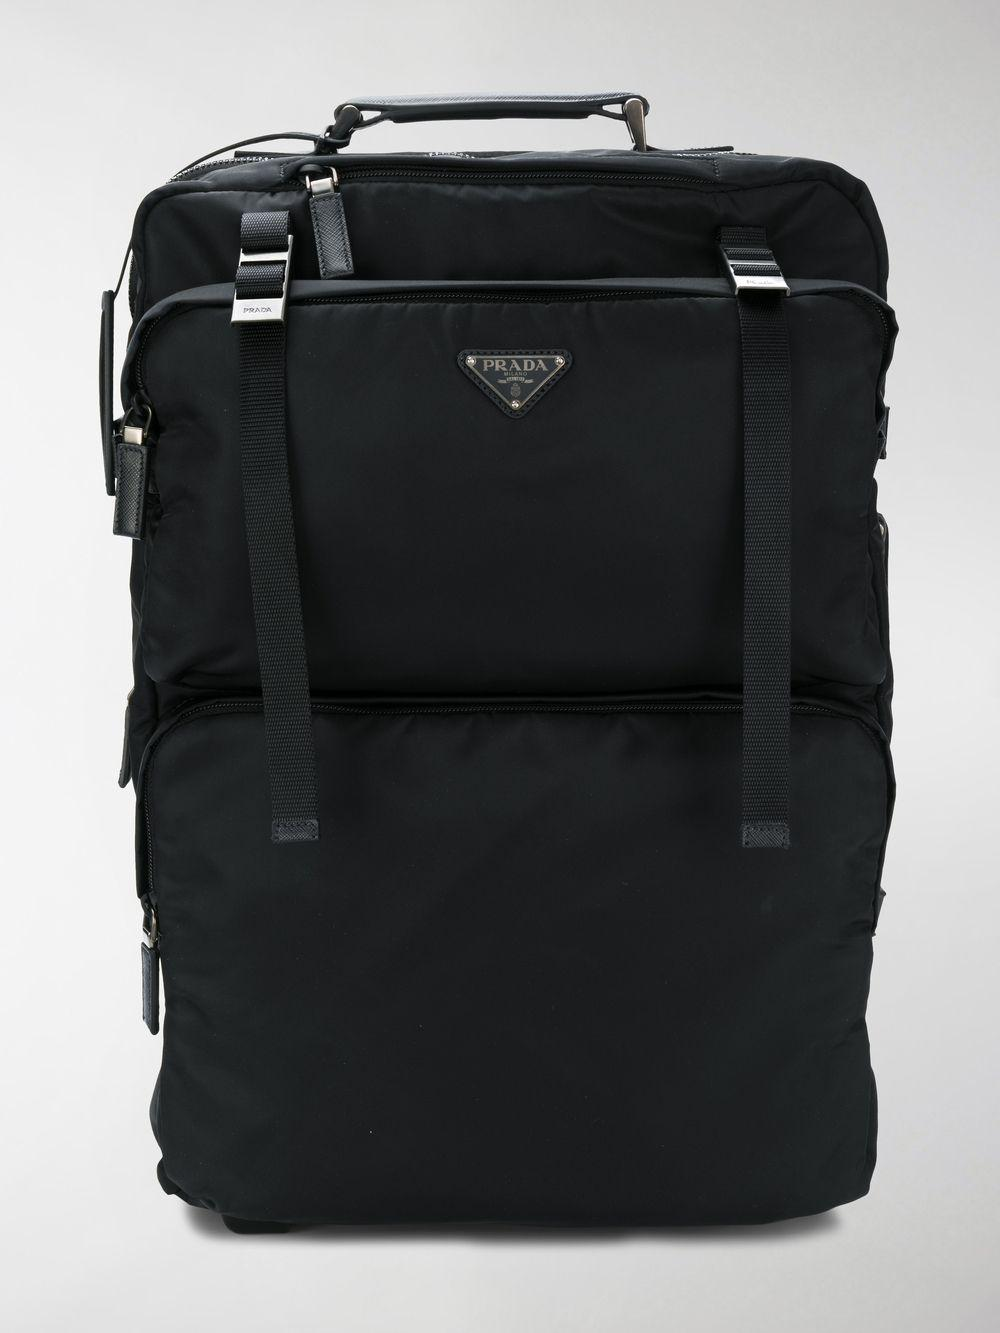 7ca244e3b60f Prada - Black Logo Trolley Travel Bag - Lyst. View fullscreen